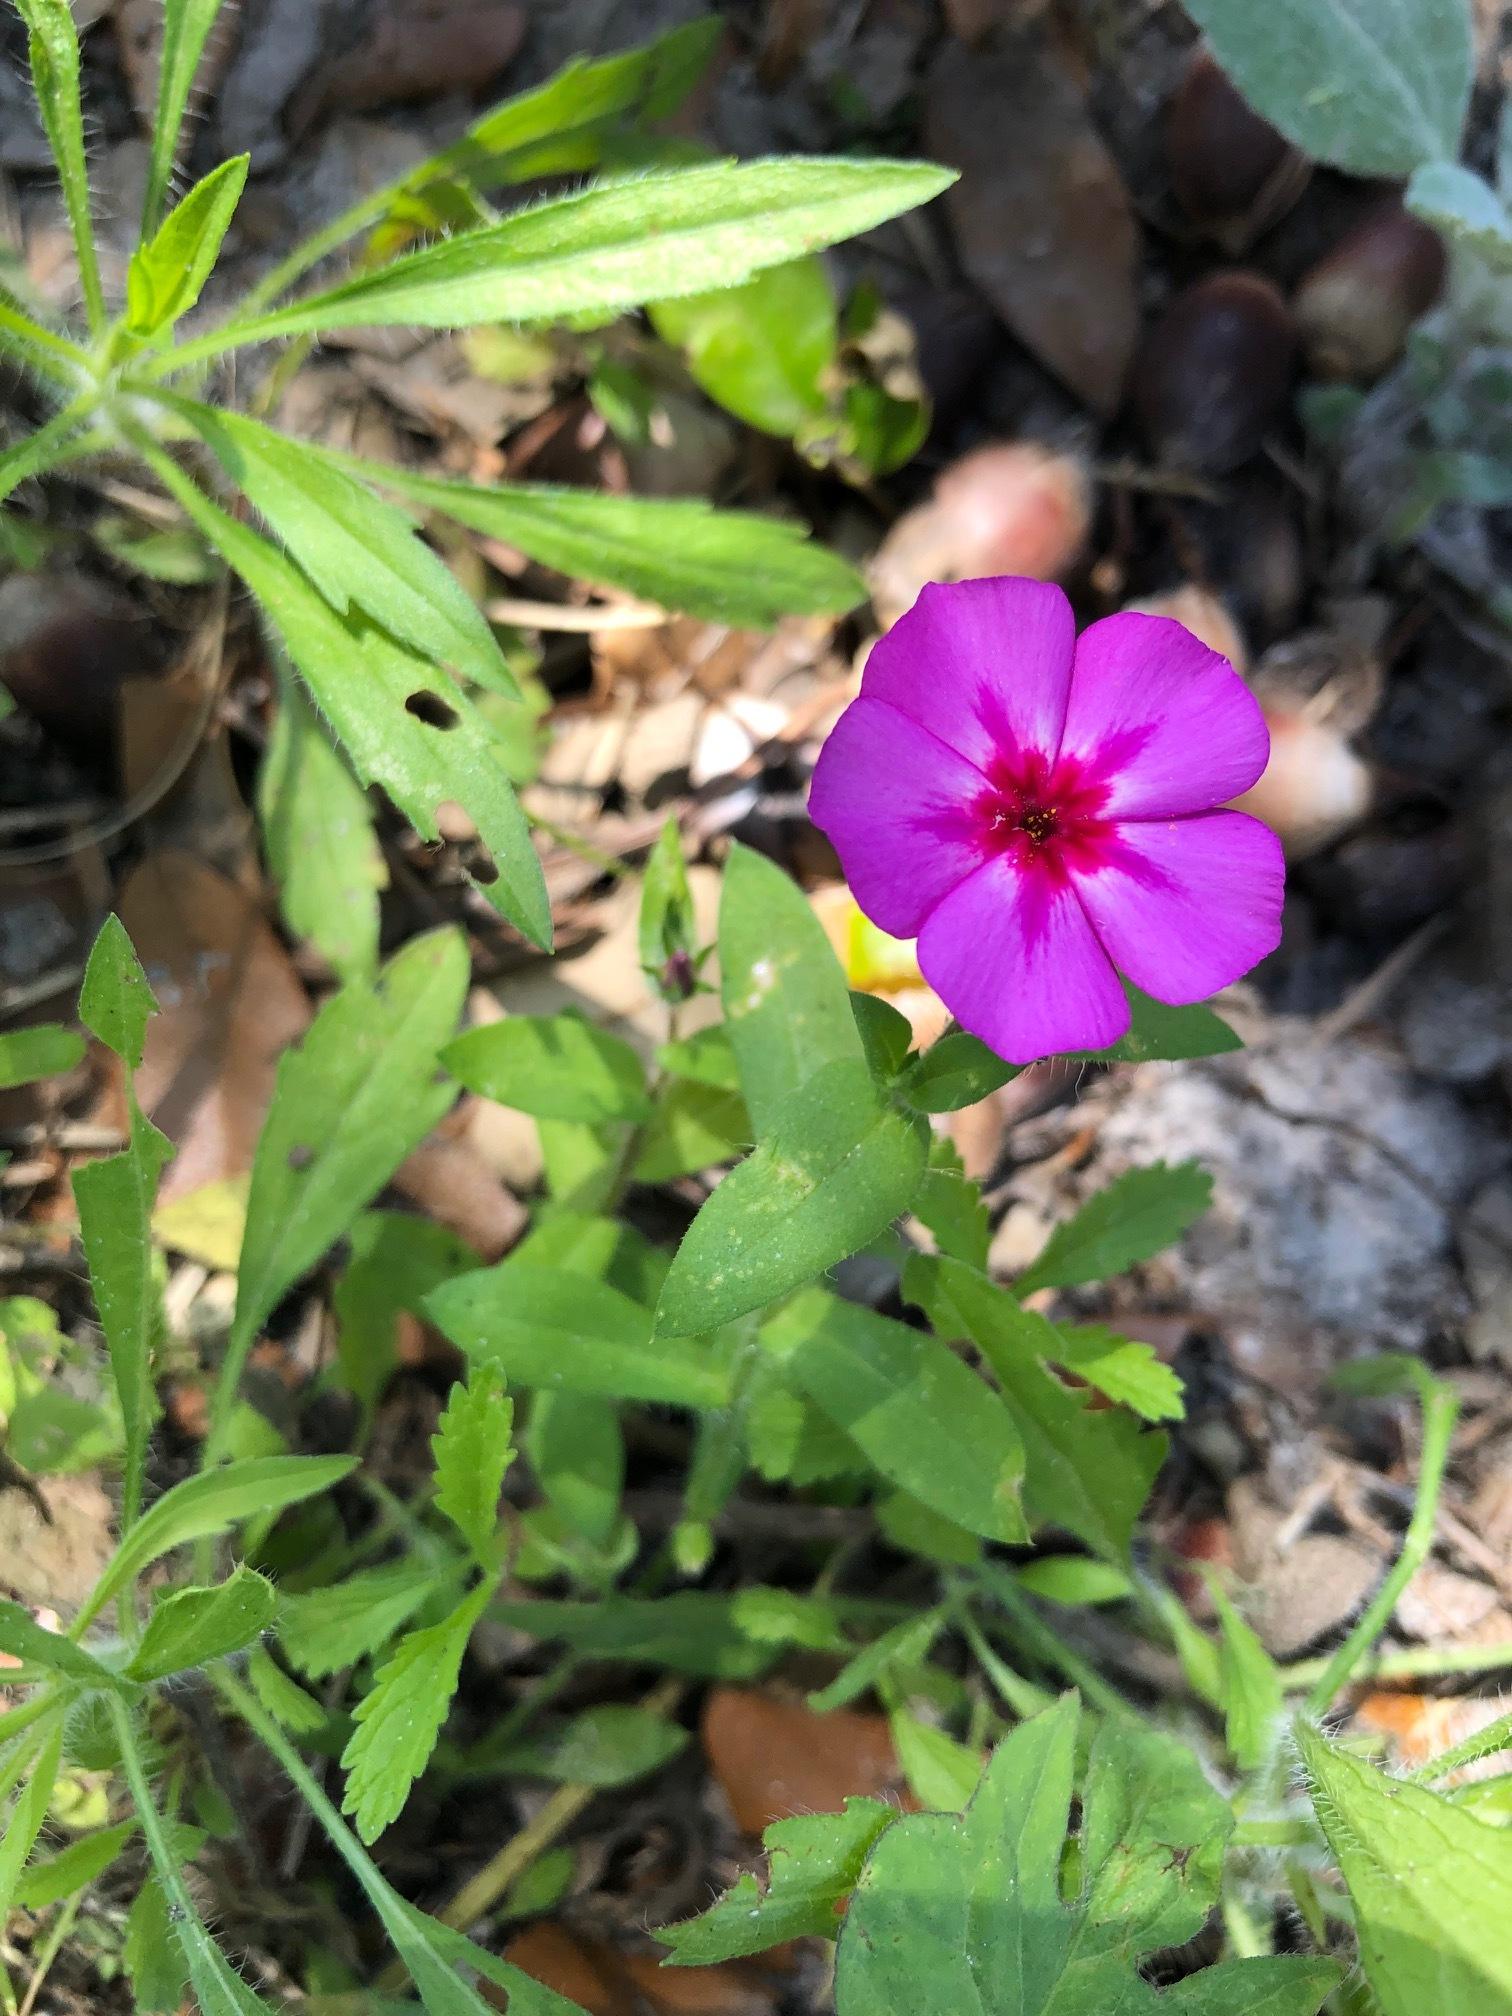 Pretty Flower @ Dog Park